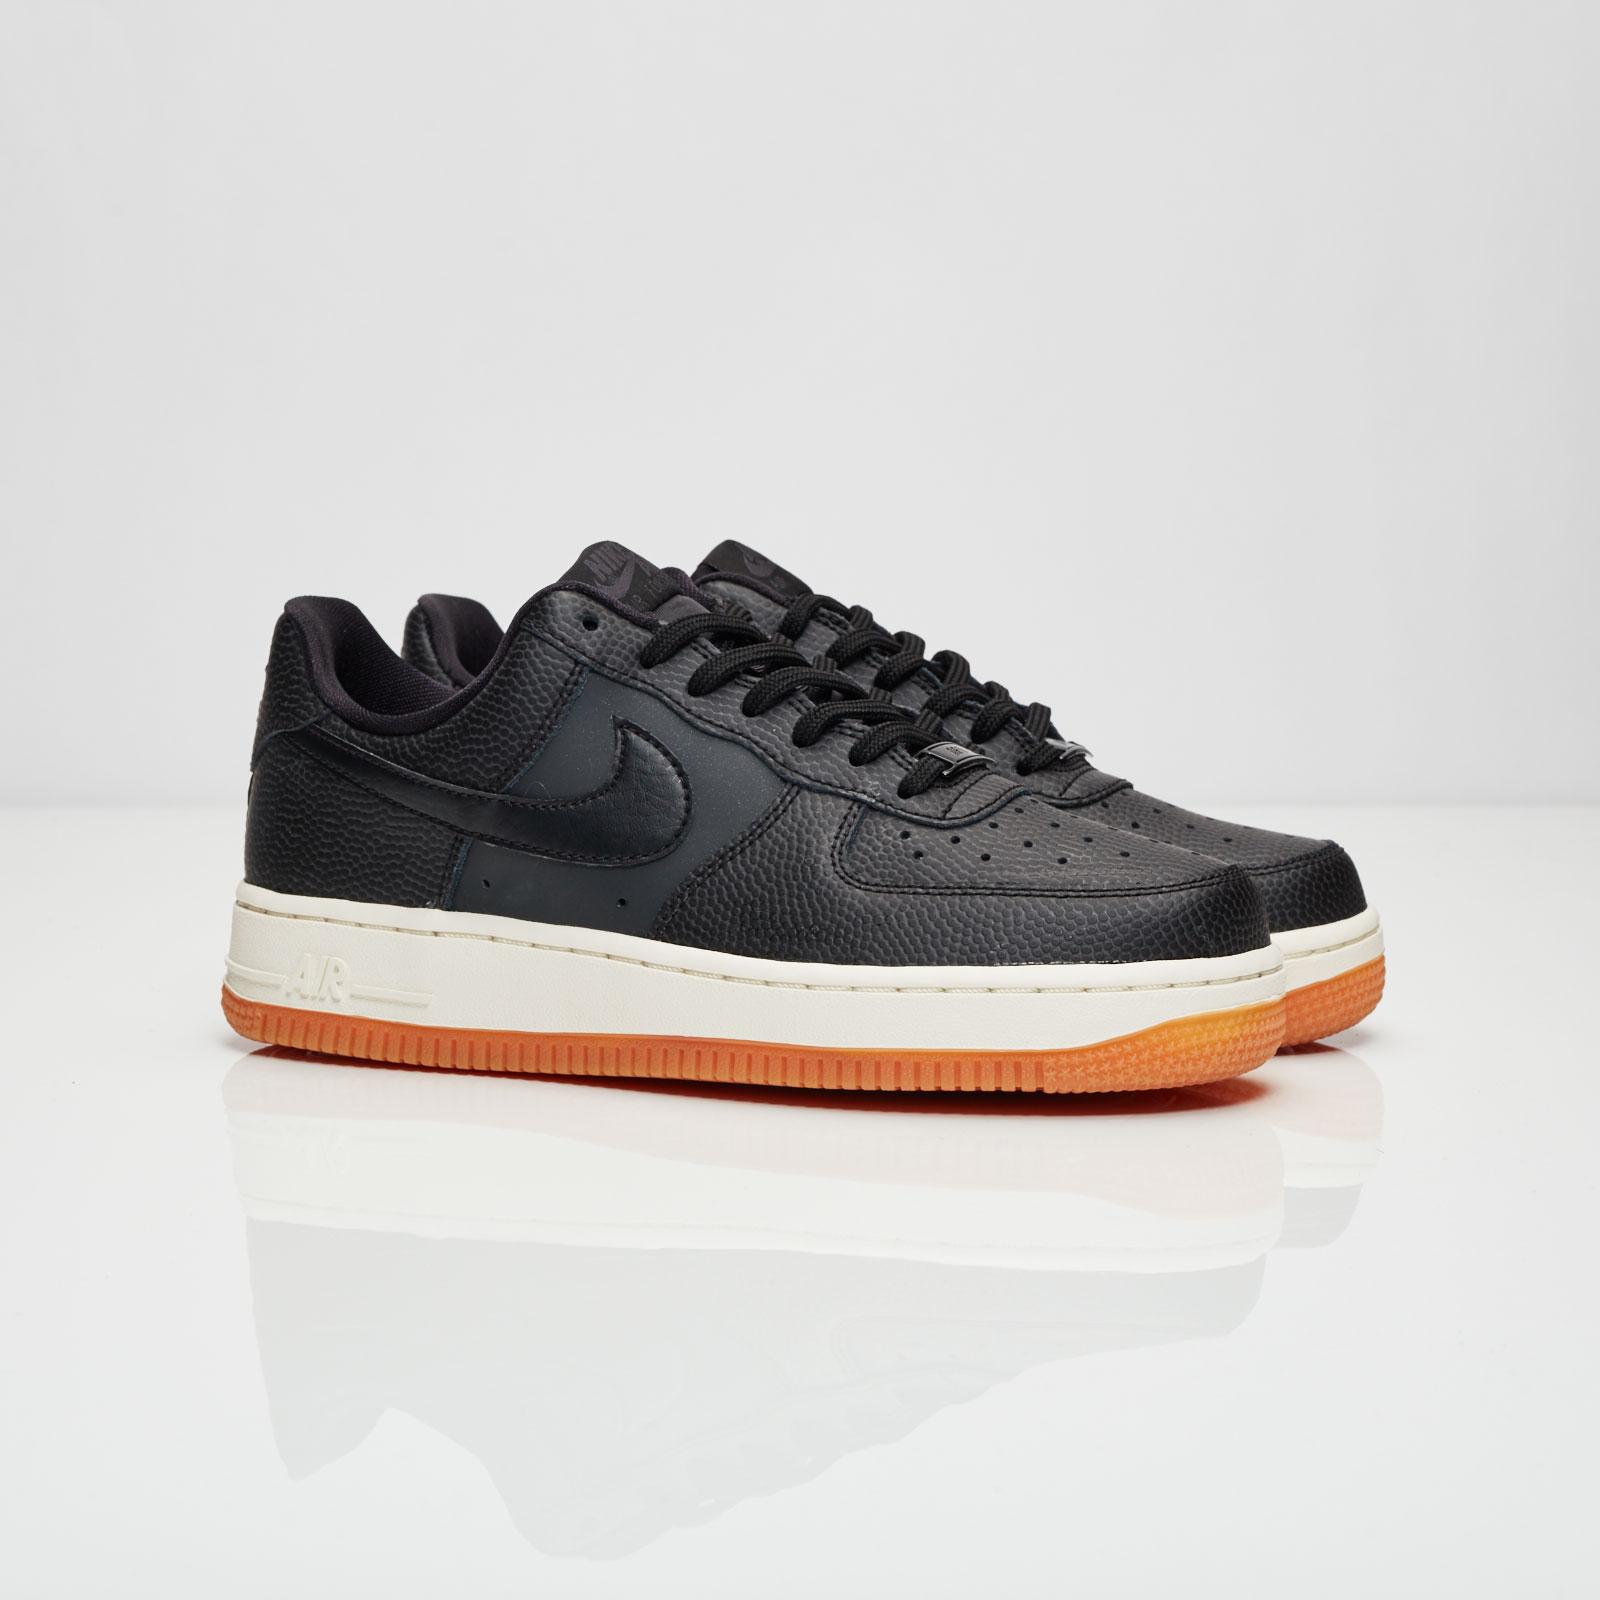 Nike Wmns Air Force 1 07 Seasonal 818594 003